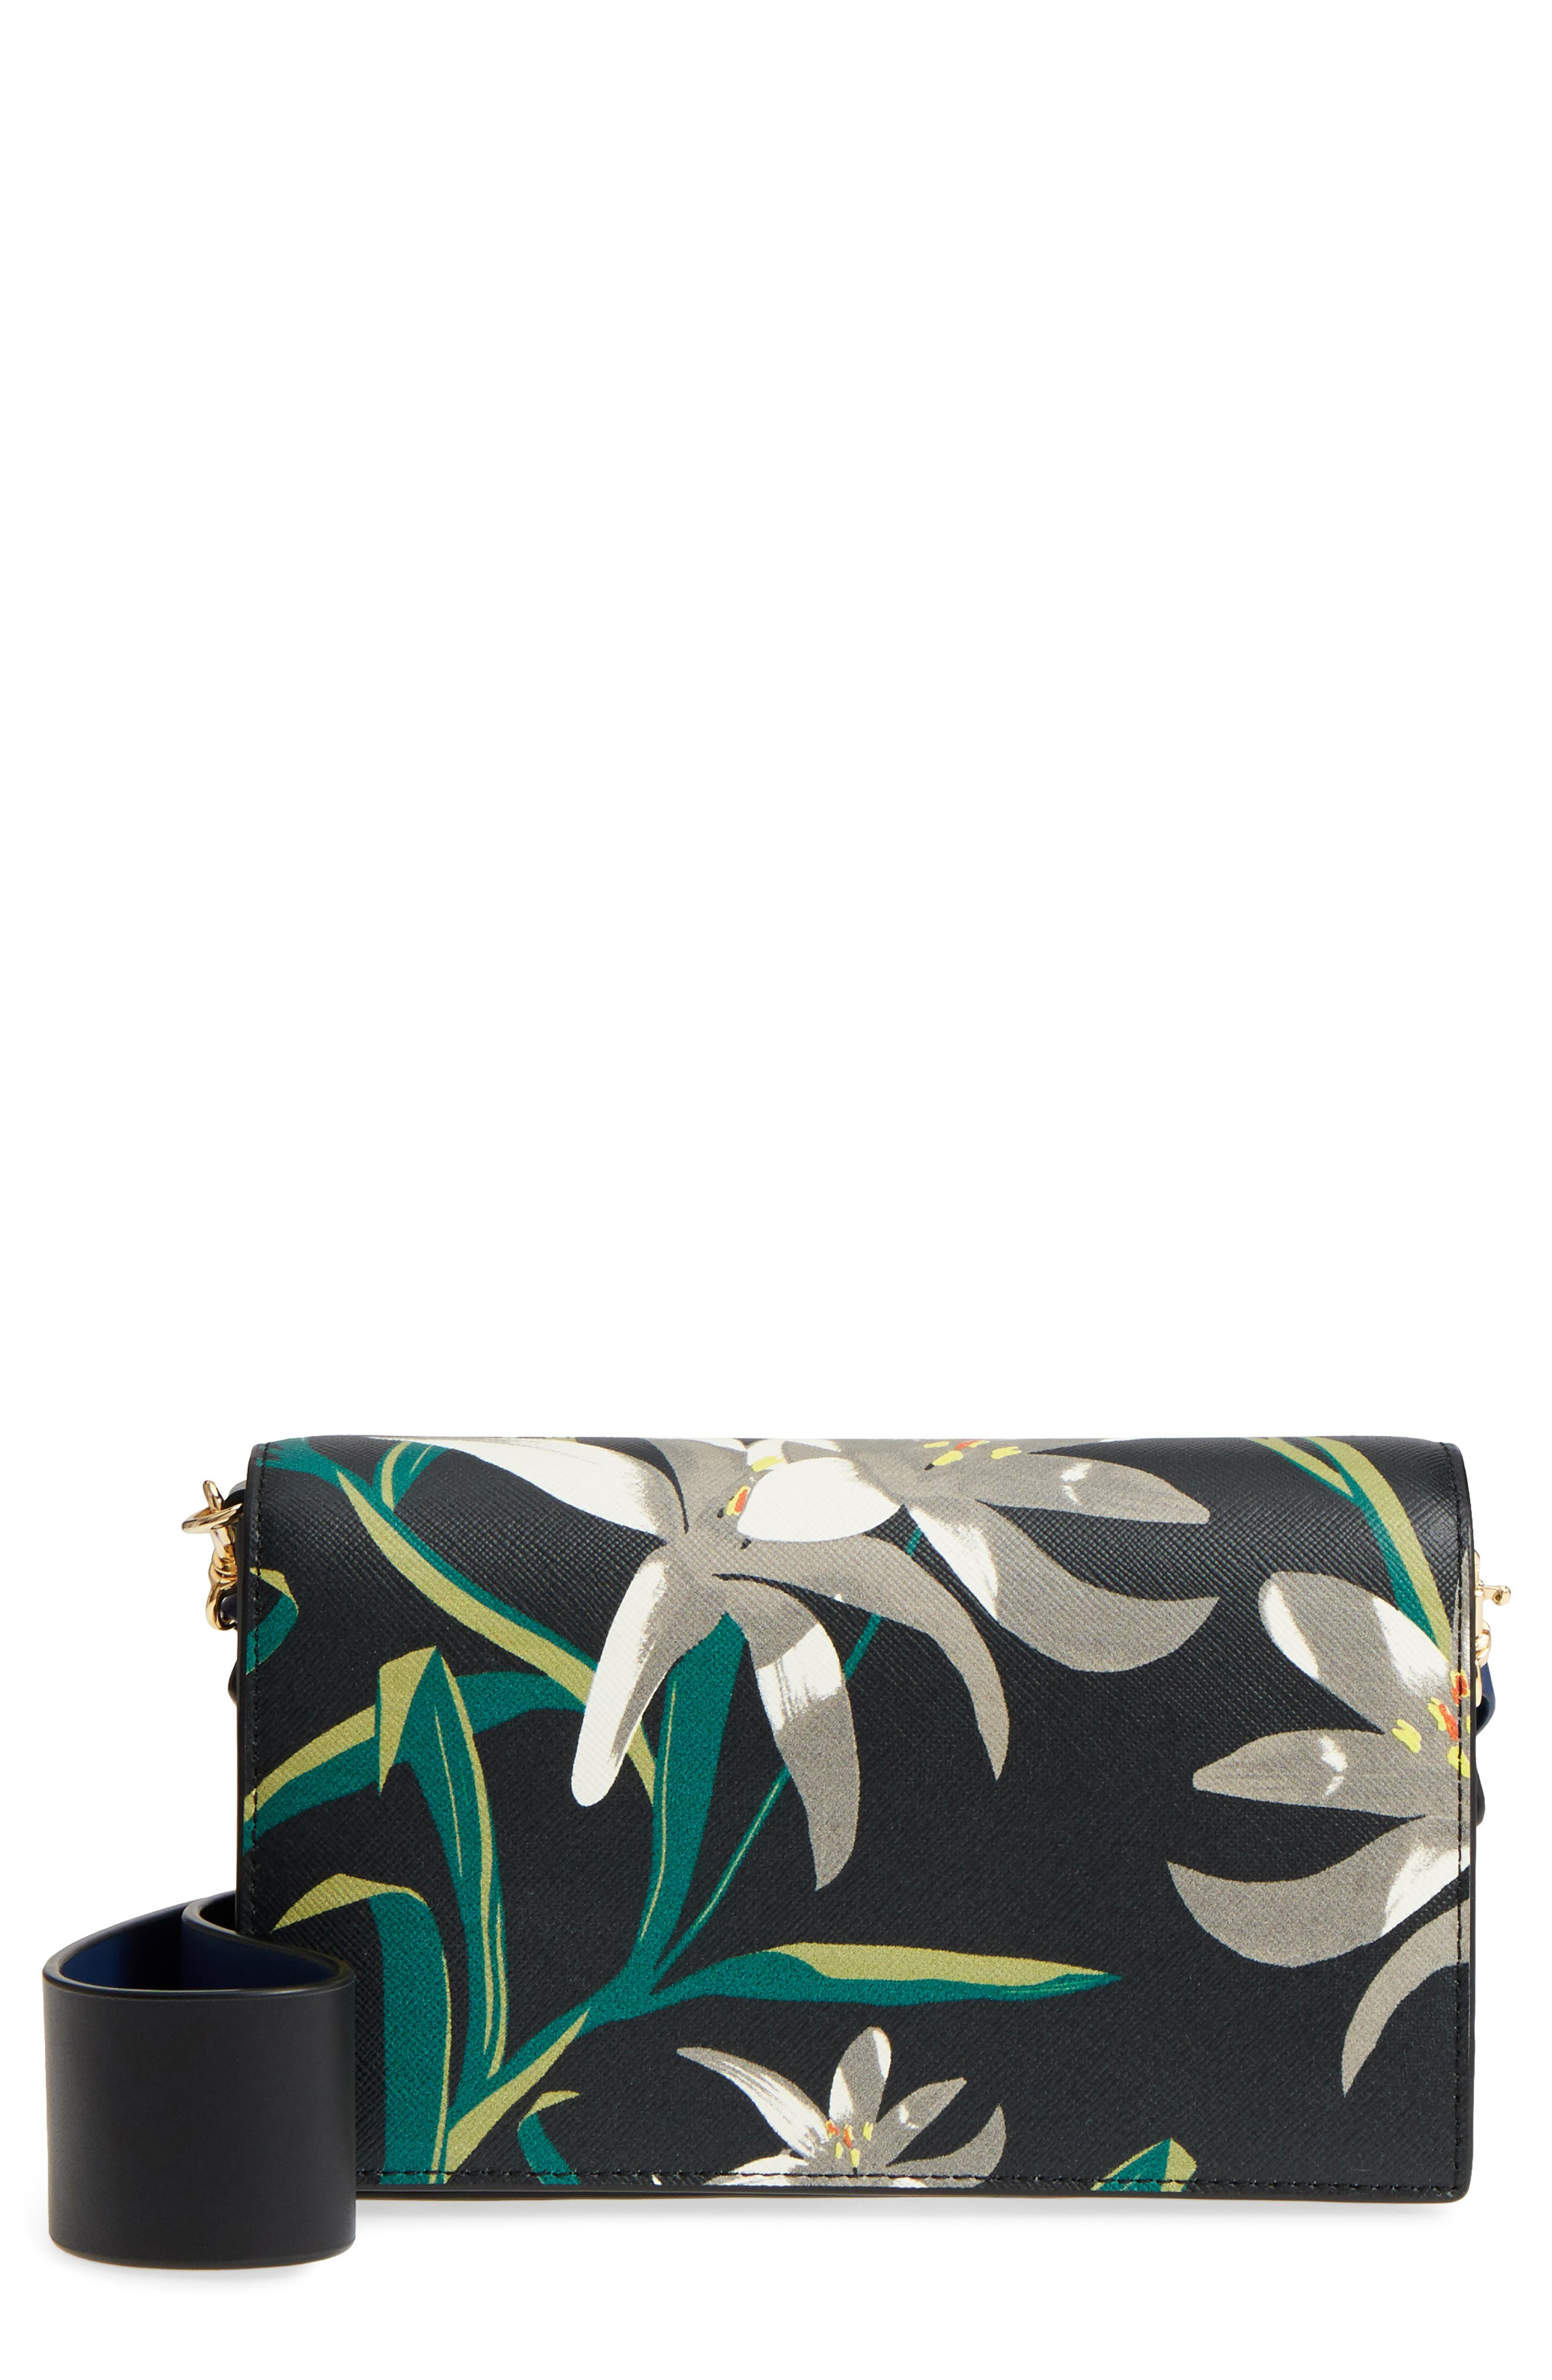 Main Image - Diane von Furstenberg Soirée Leather Convertible Crossbody Bag